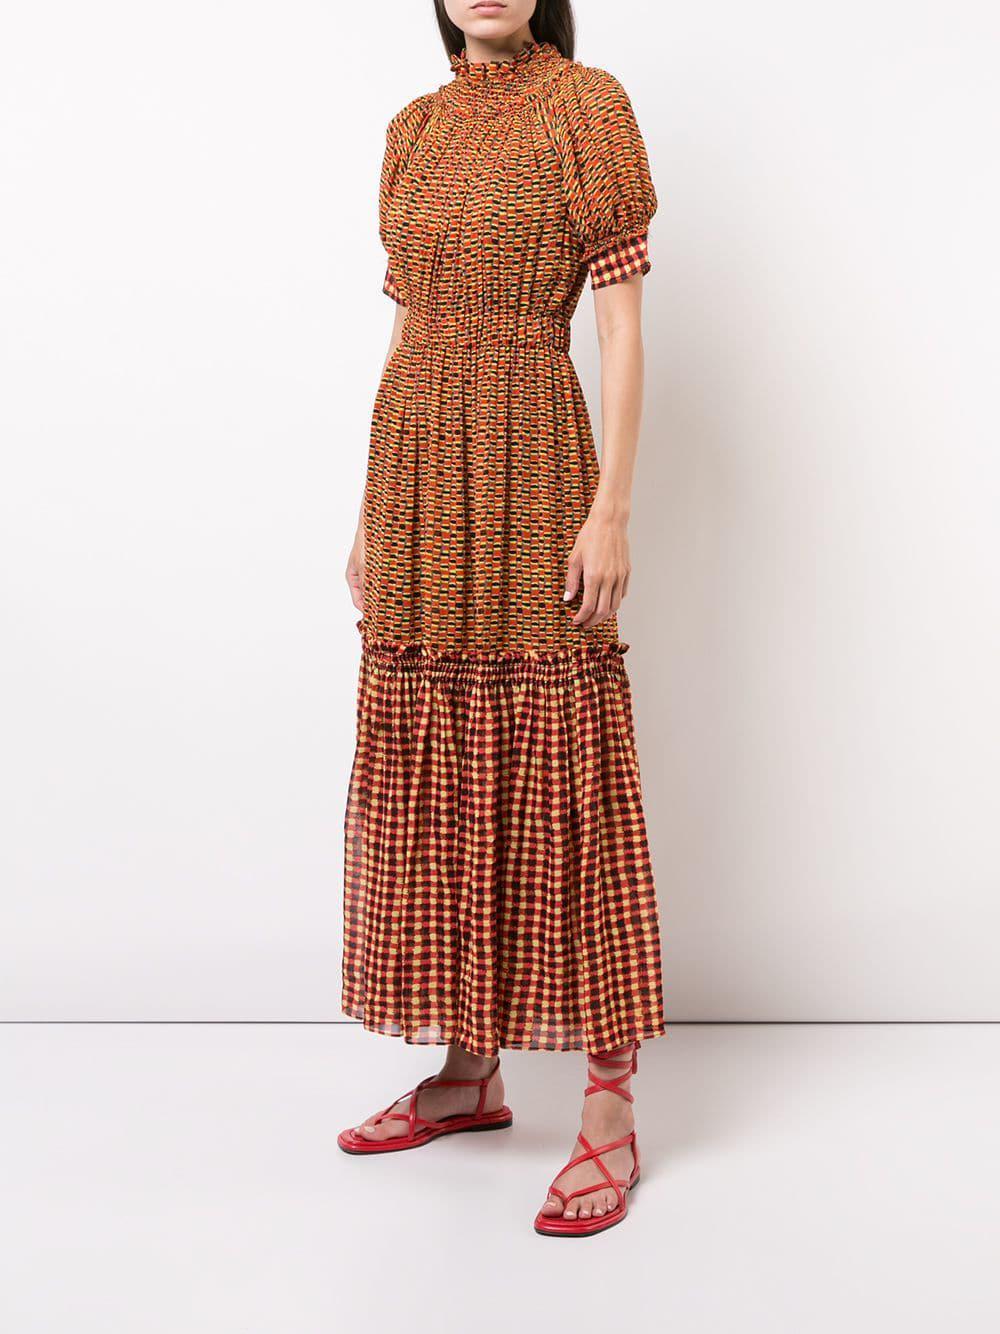 81fe2249016ea Lyst - Proenza Schouler Crepe Chiffon Tiered Dress in Yellow